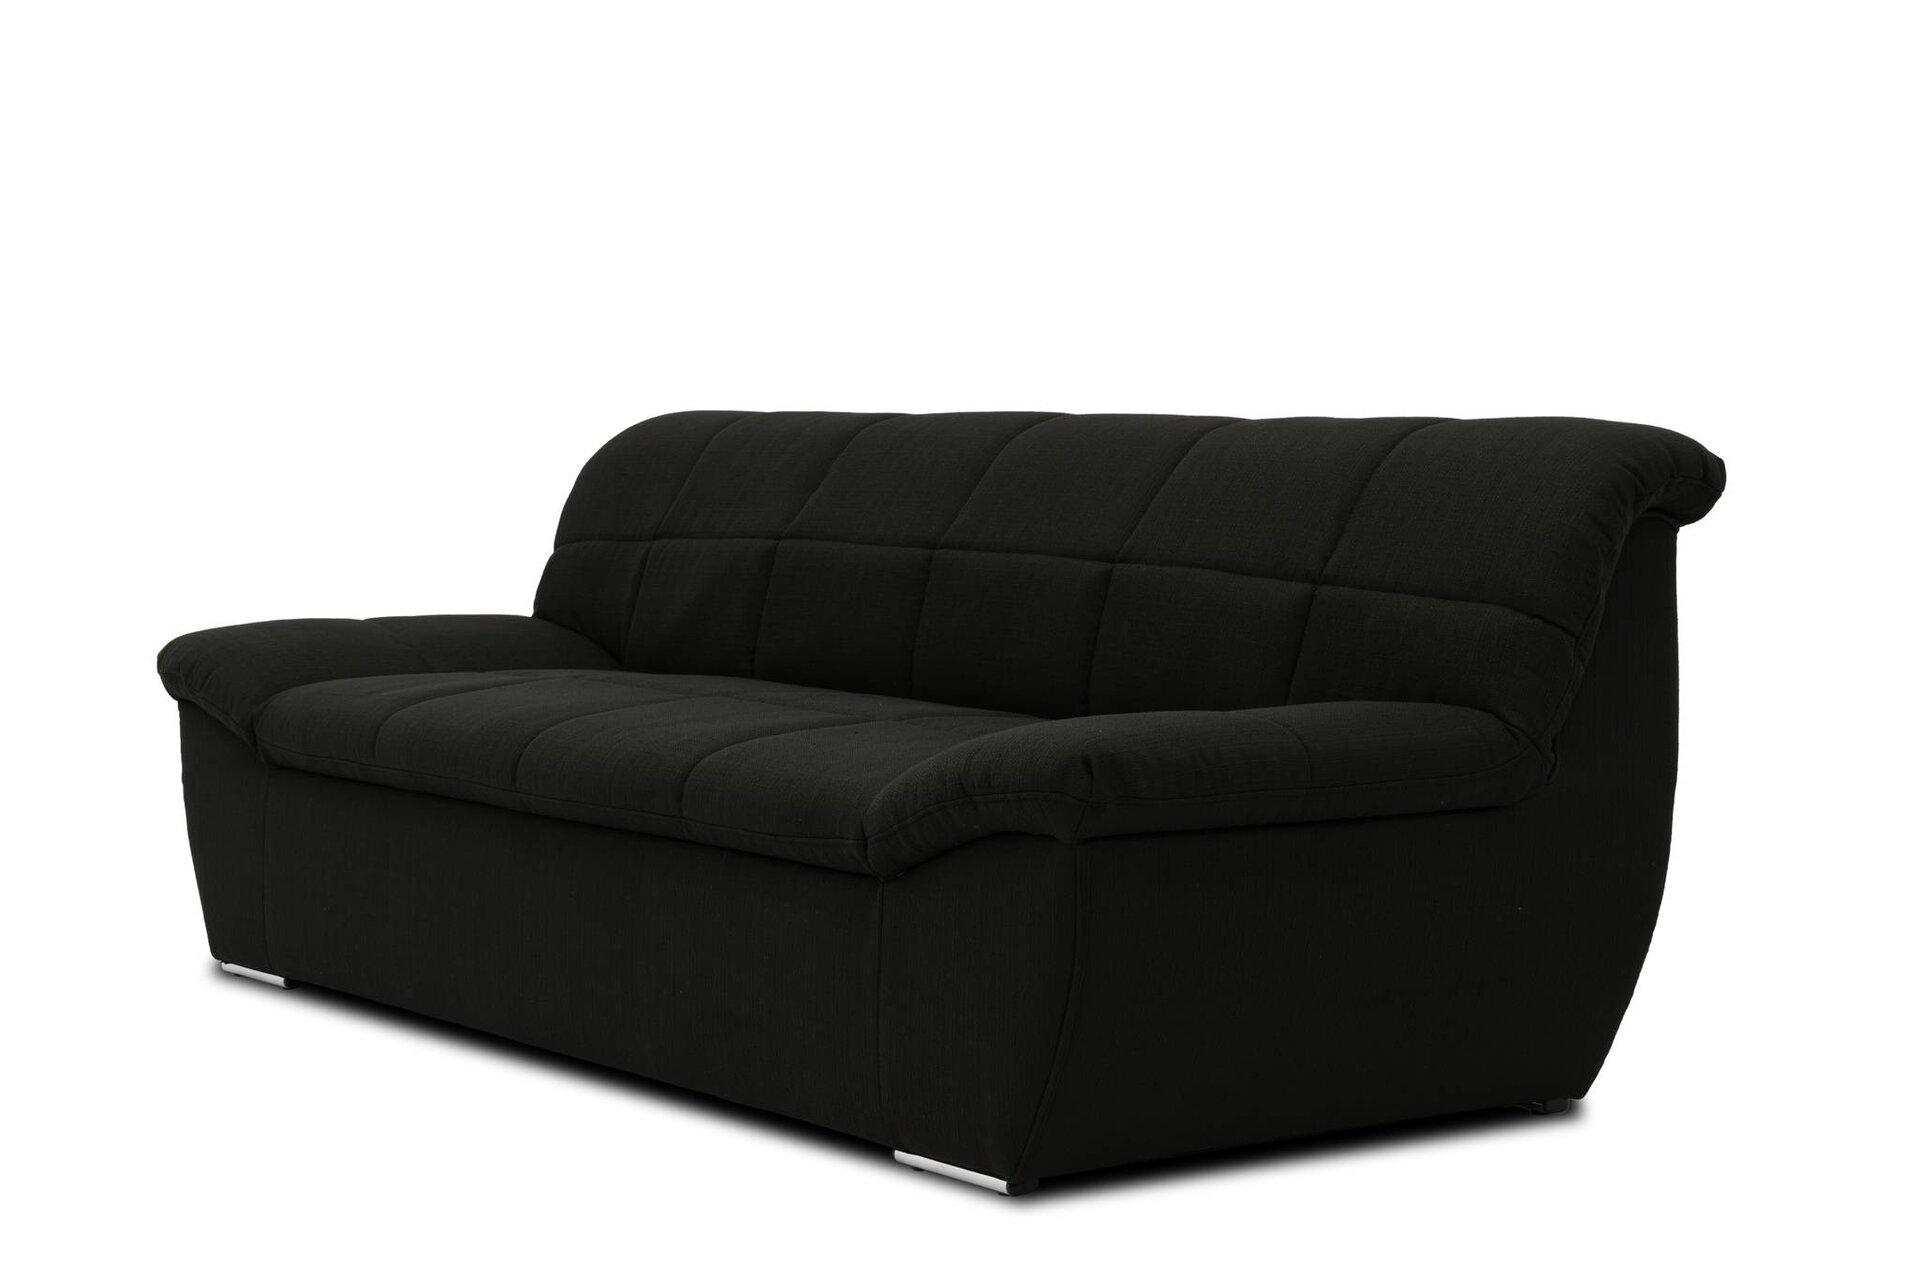 Sofa 2-Sitzer Splash Domo Collection Textil schwarz 96 x 76 x 211 cm